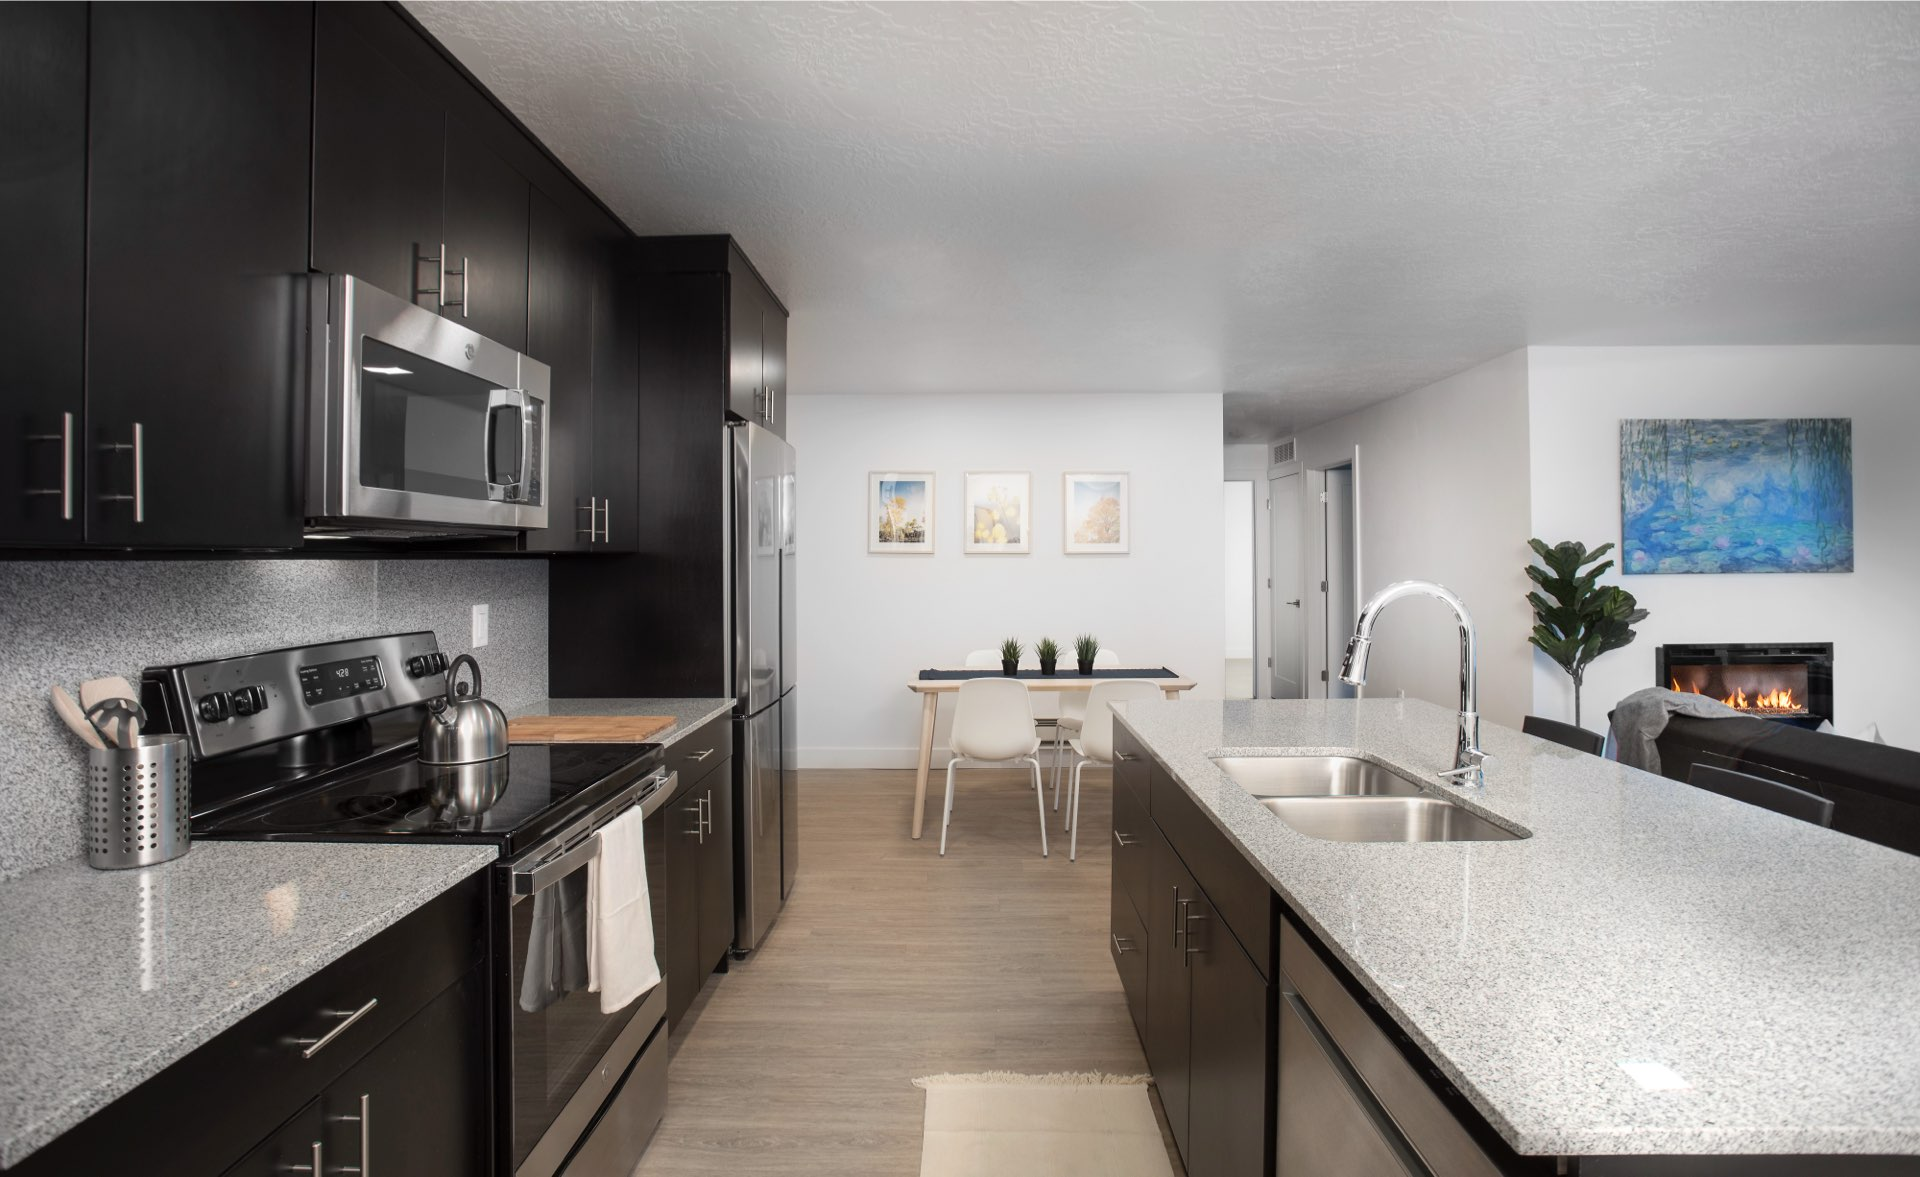 Apartment, Central Village Condominiums, architectural design by Elliott Workgroup